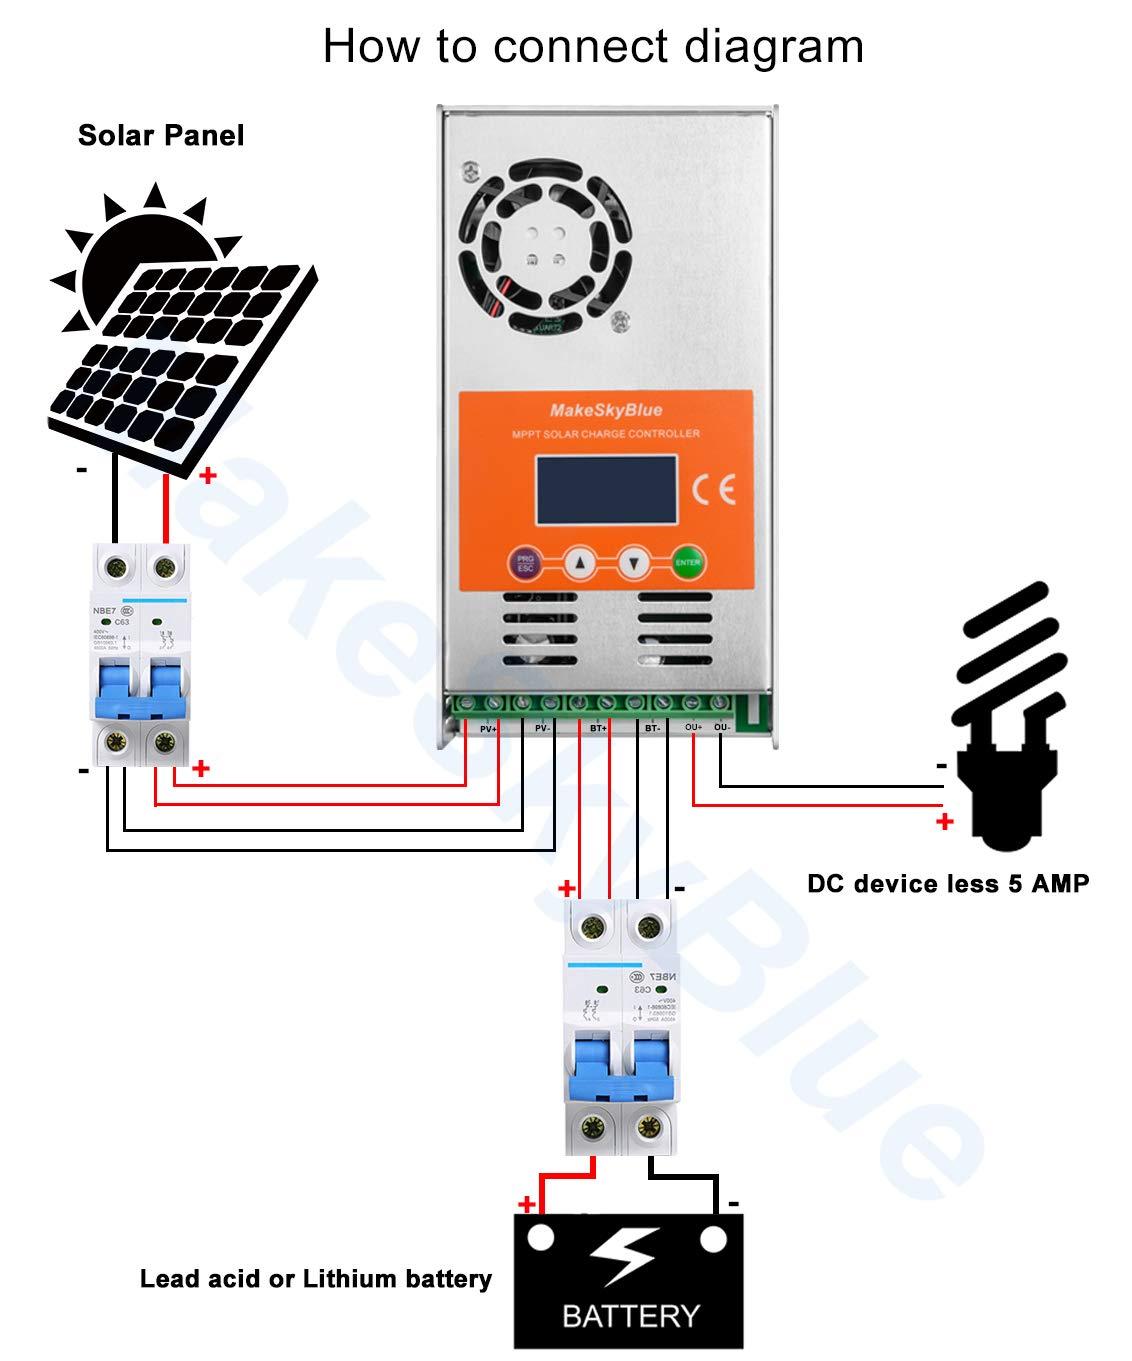 MakeSkyBlue MPPT Solar Charge Controller 60A Current Charge Regulator for 12V 24V 36V 48V Acid Gel Sealed Flooded Lithium Batteries LCD Display Maximum PV 2800W by MakeSkyBlue (Image #5)